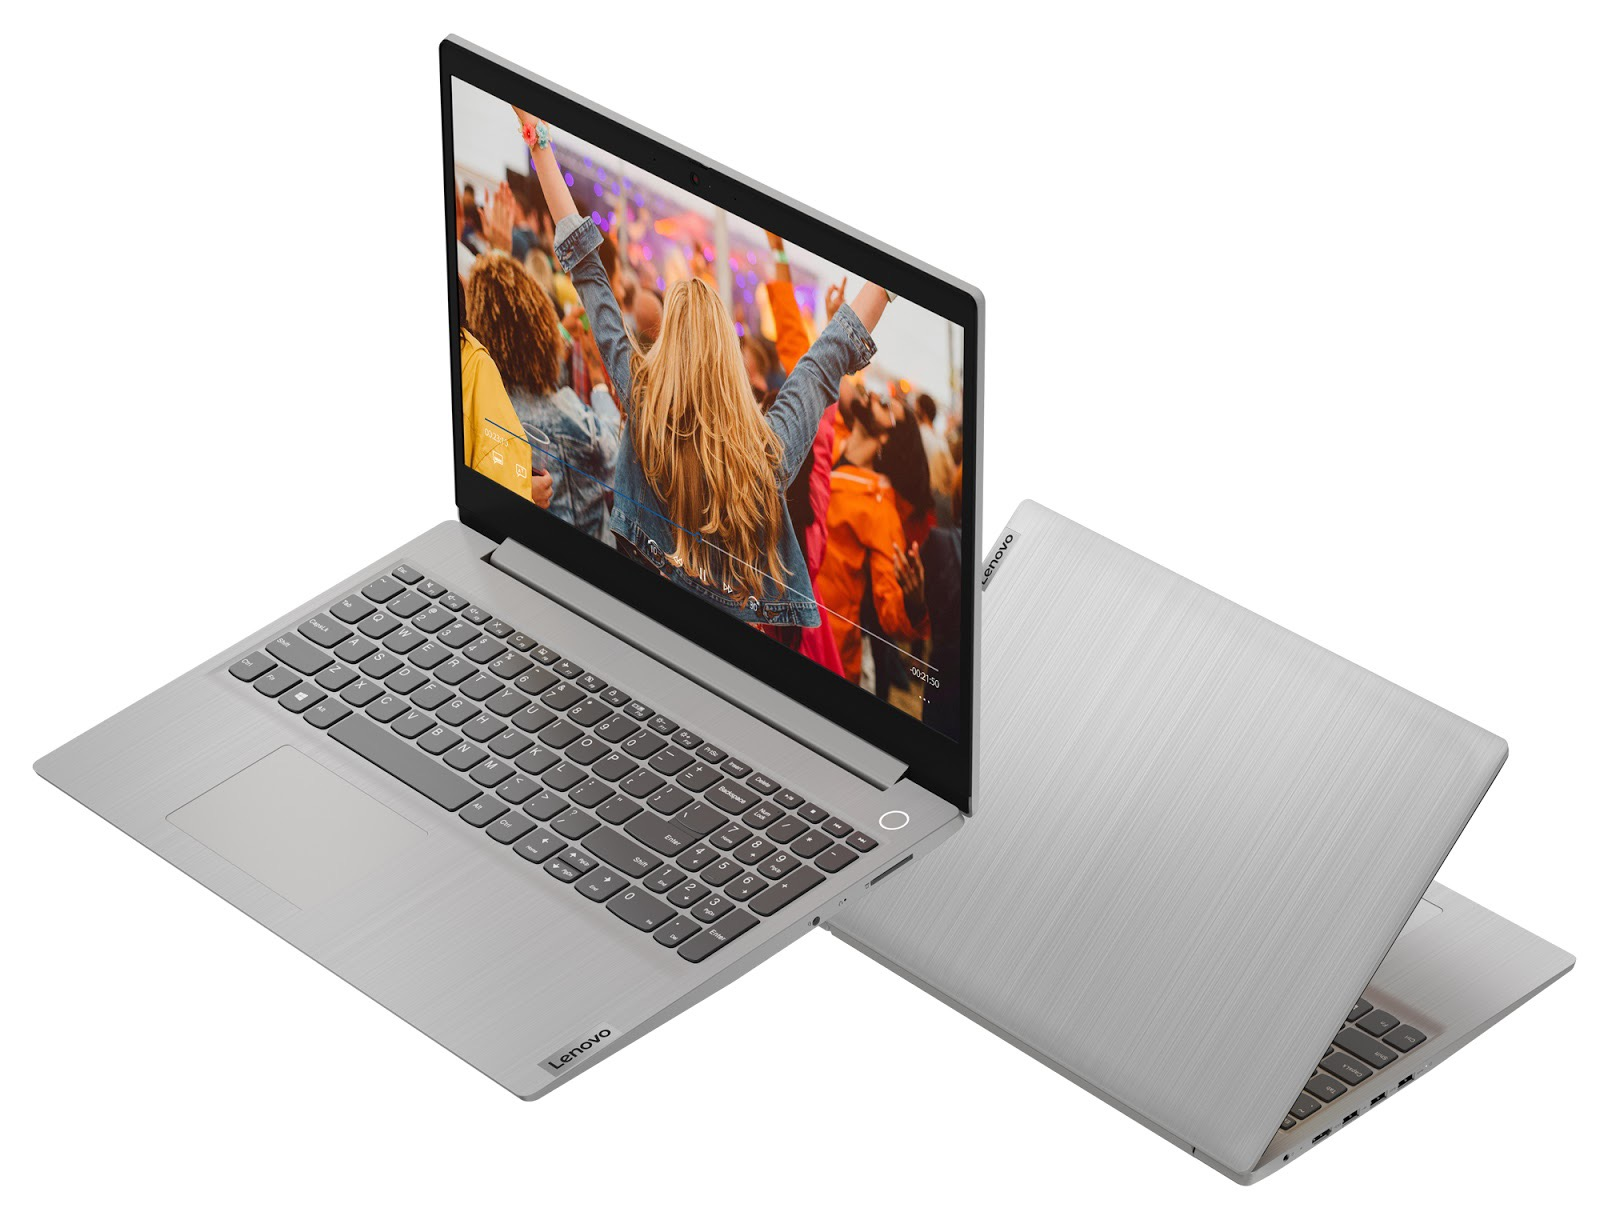 Фото 3. Ноутбук Lenovo ideapad 3 15ADA05 Platinum Grey (81W100TBRE)